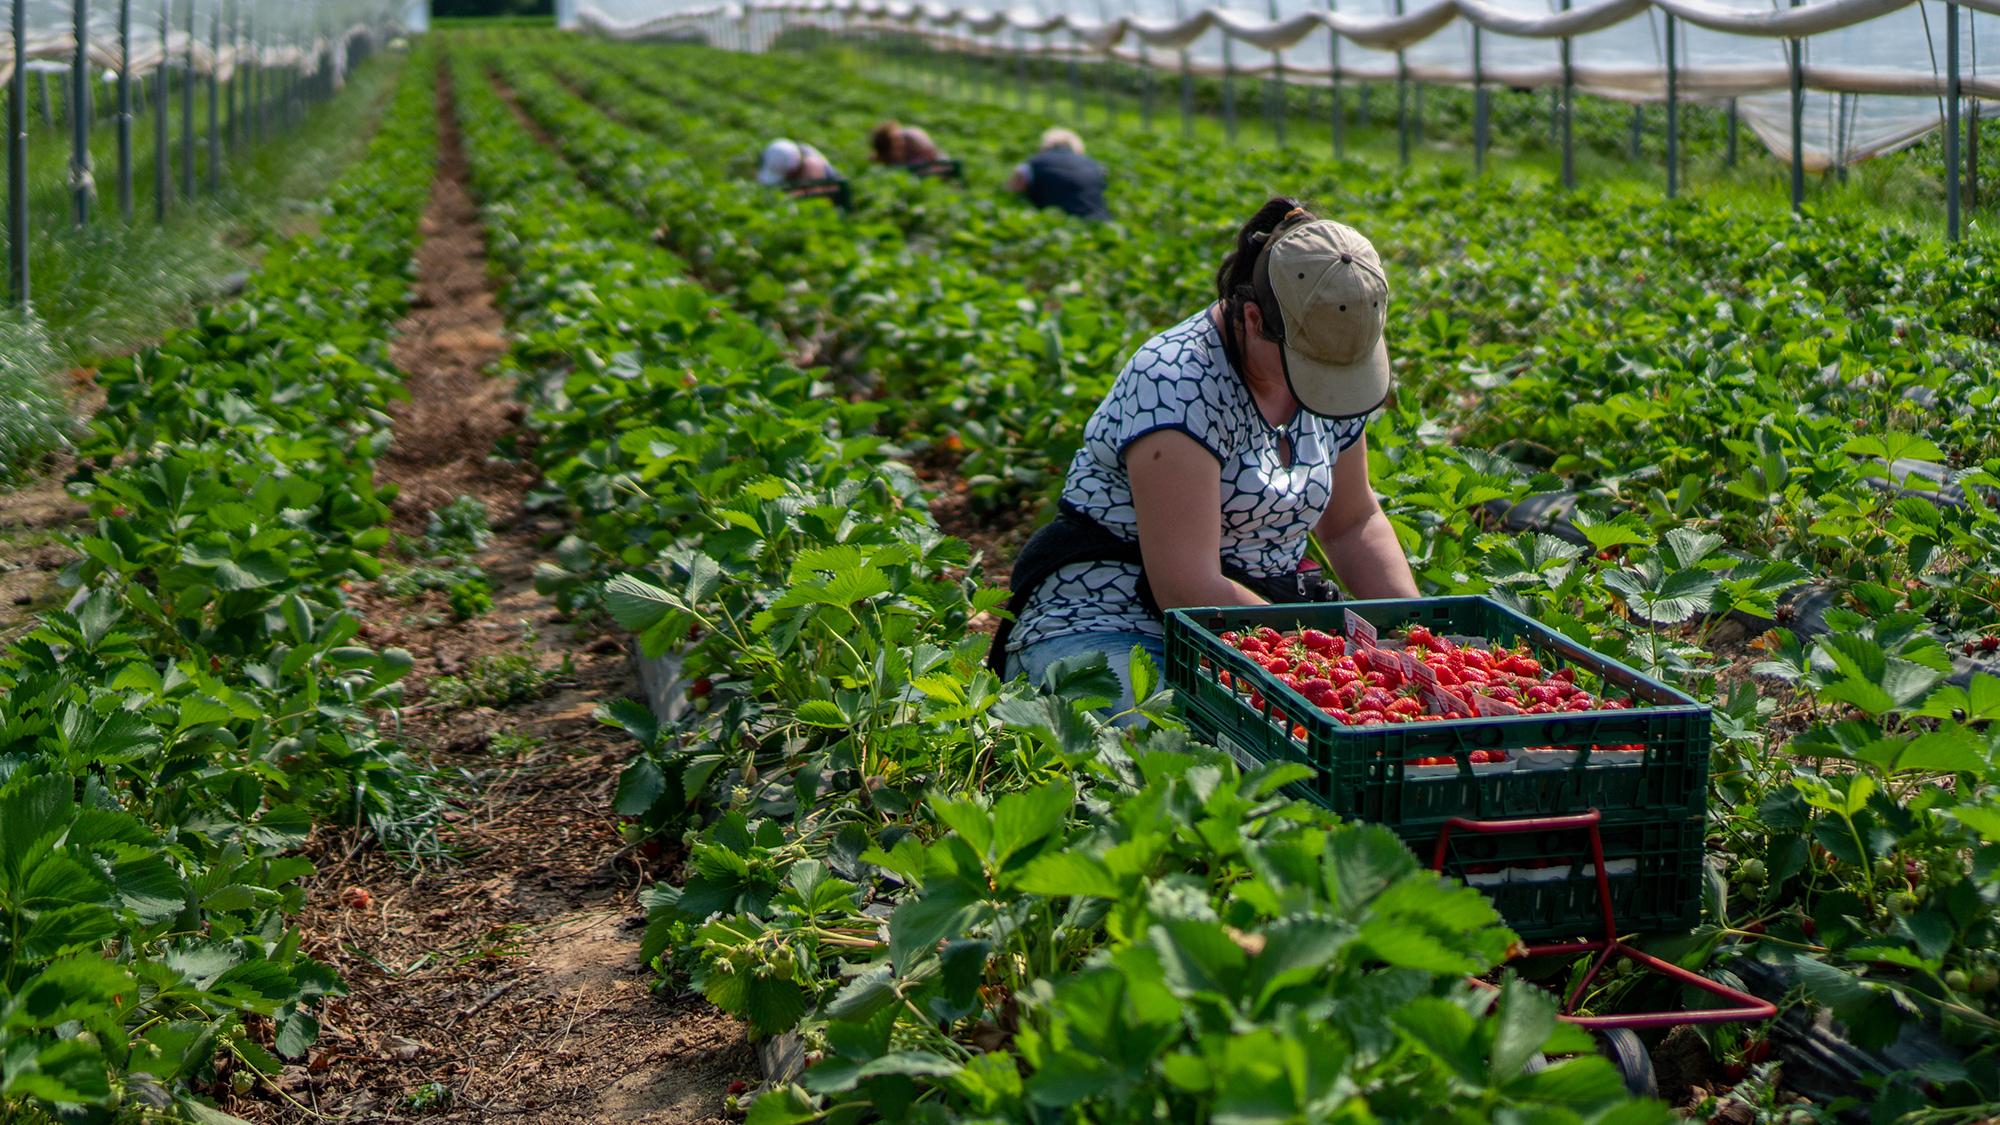 A woman picking fruit. (Image: Shutterstock)